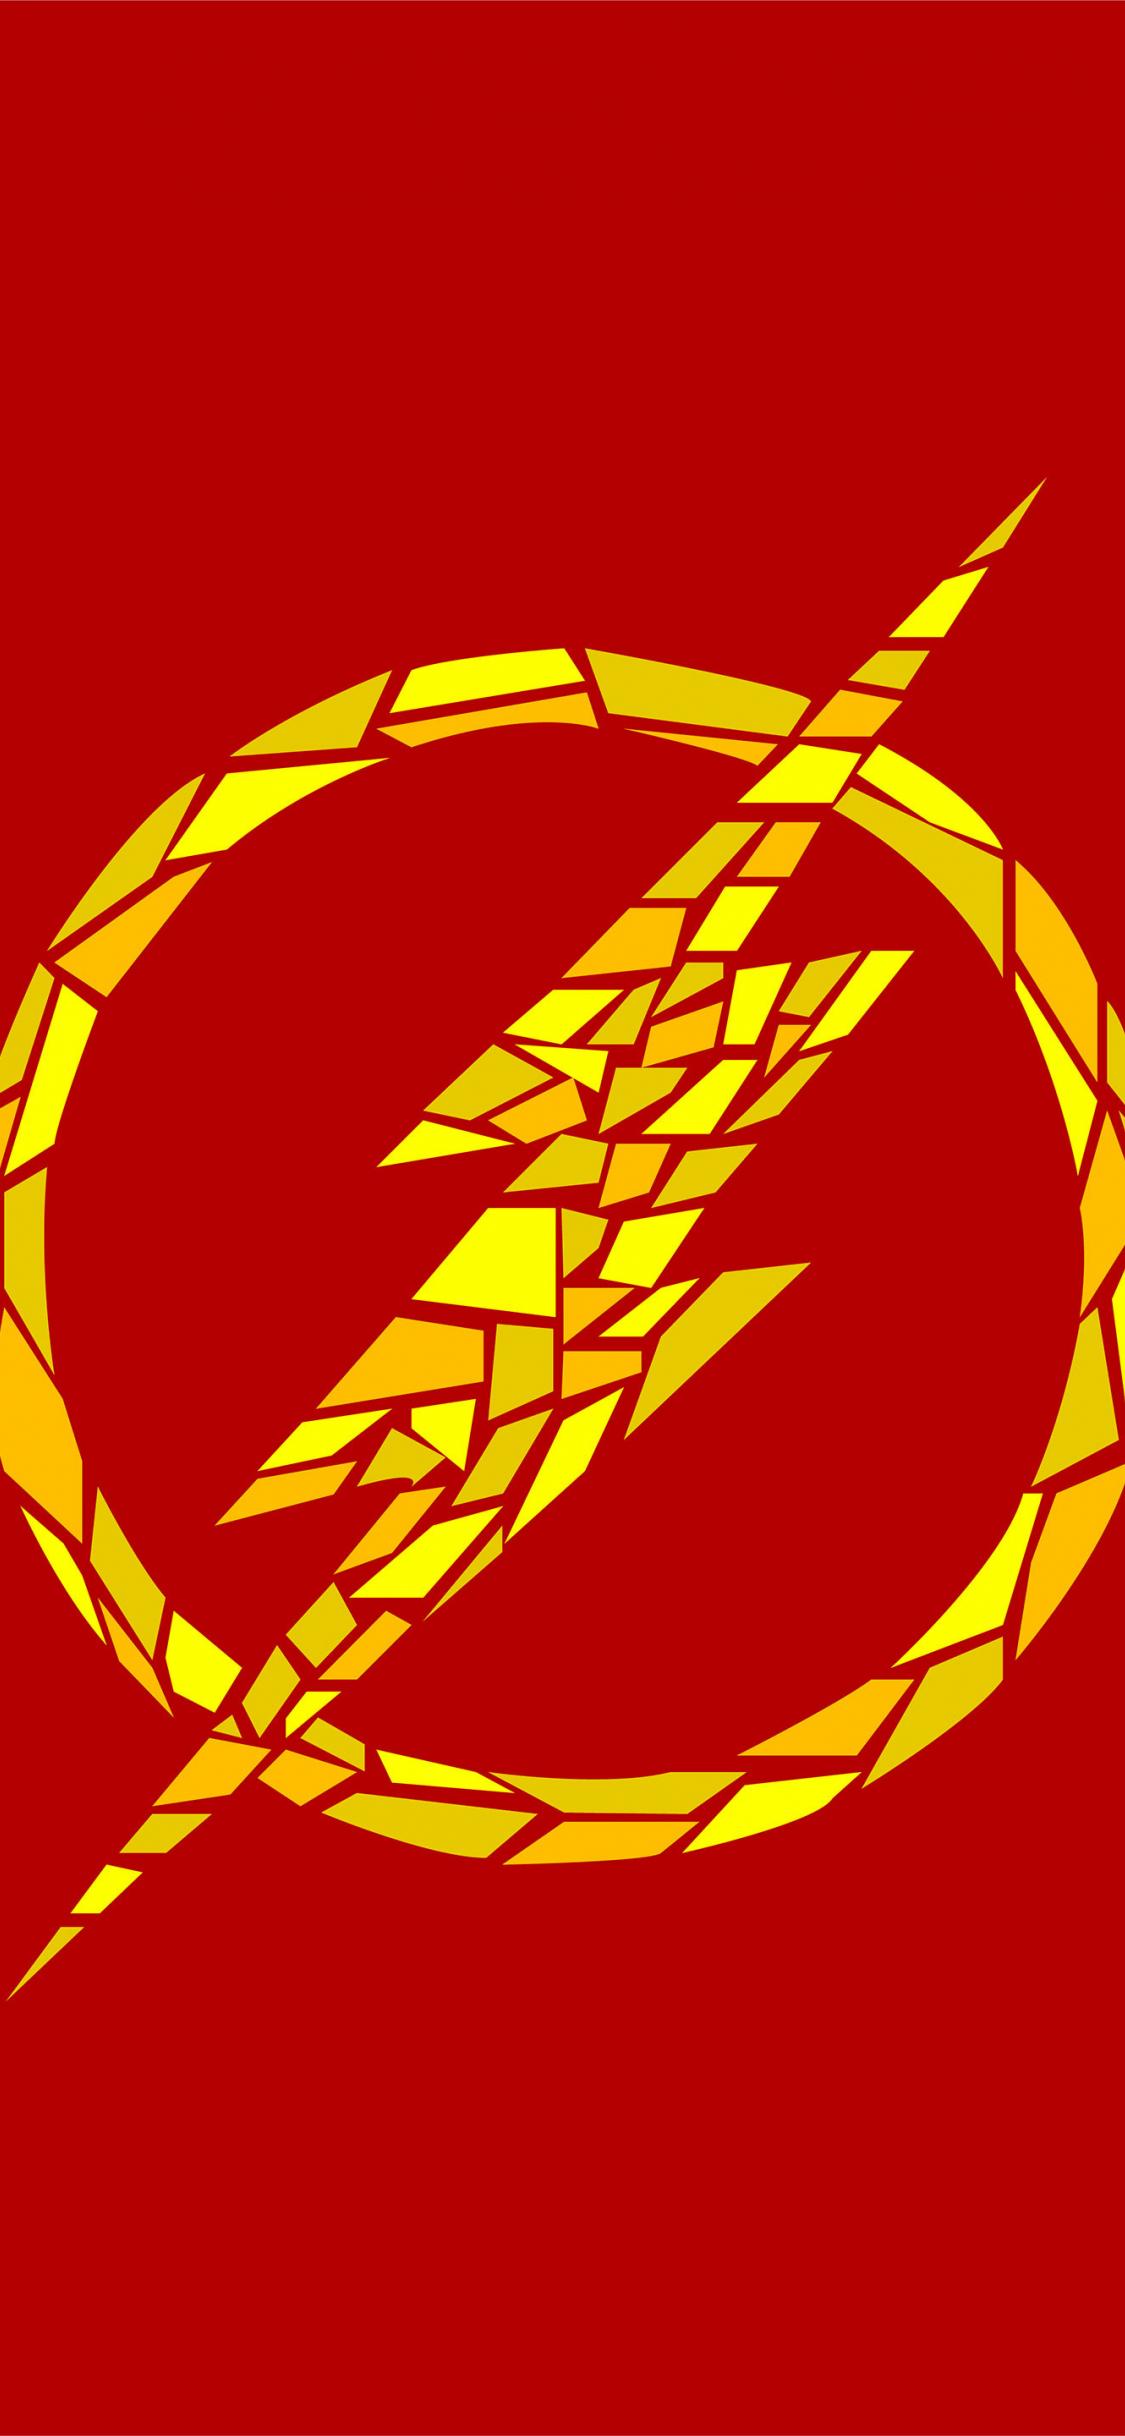 Download 1125x2436 Wallpaper The Flash Logo Mosaic Artwork